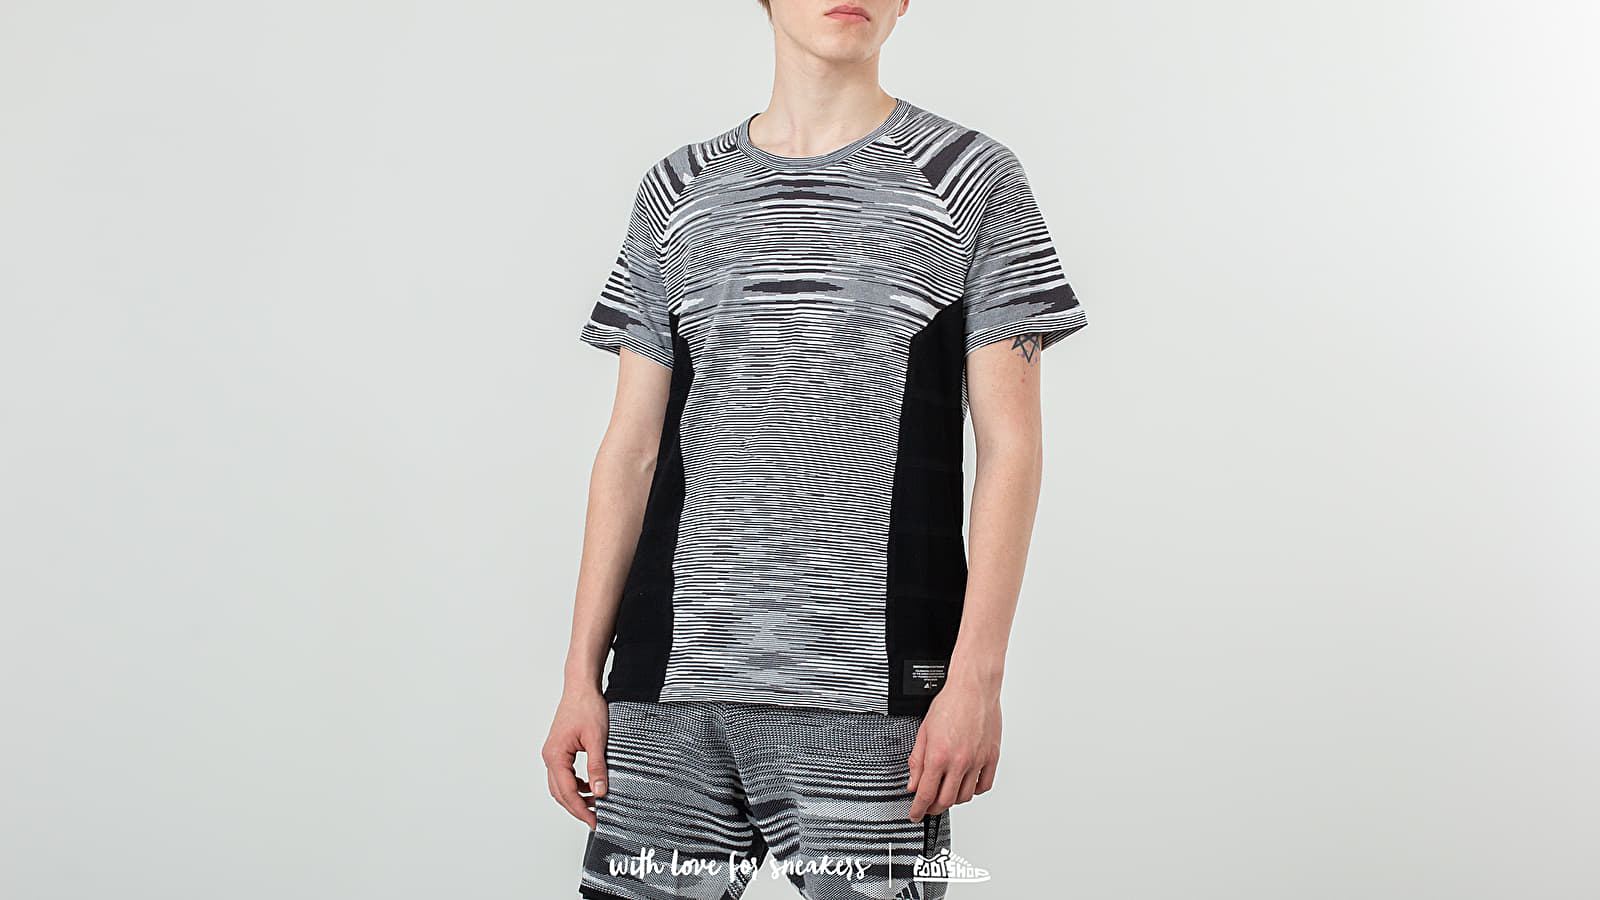 Magliette adidas x Missoni Cru Tee Black/ White/ Dark Grey